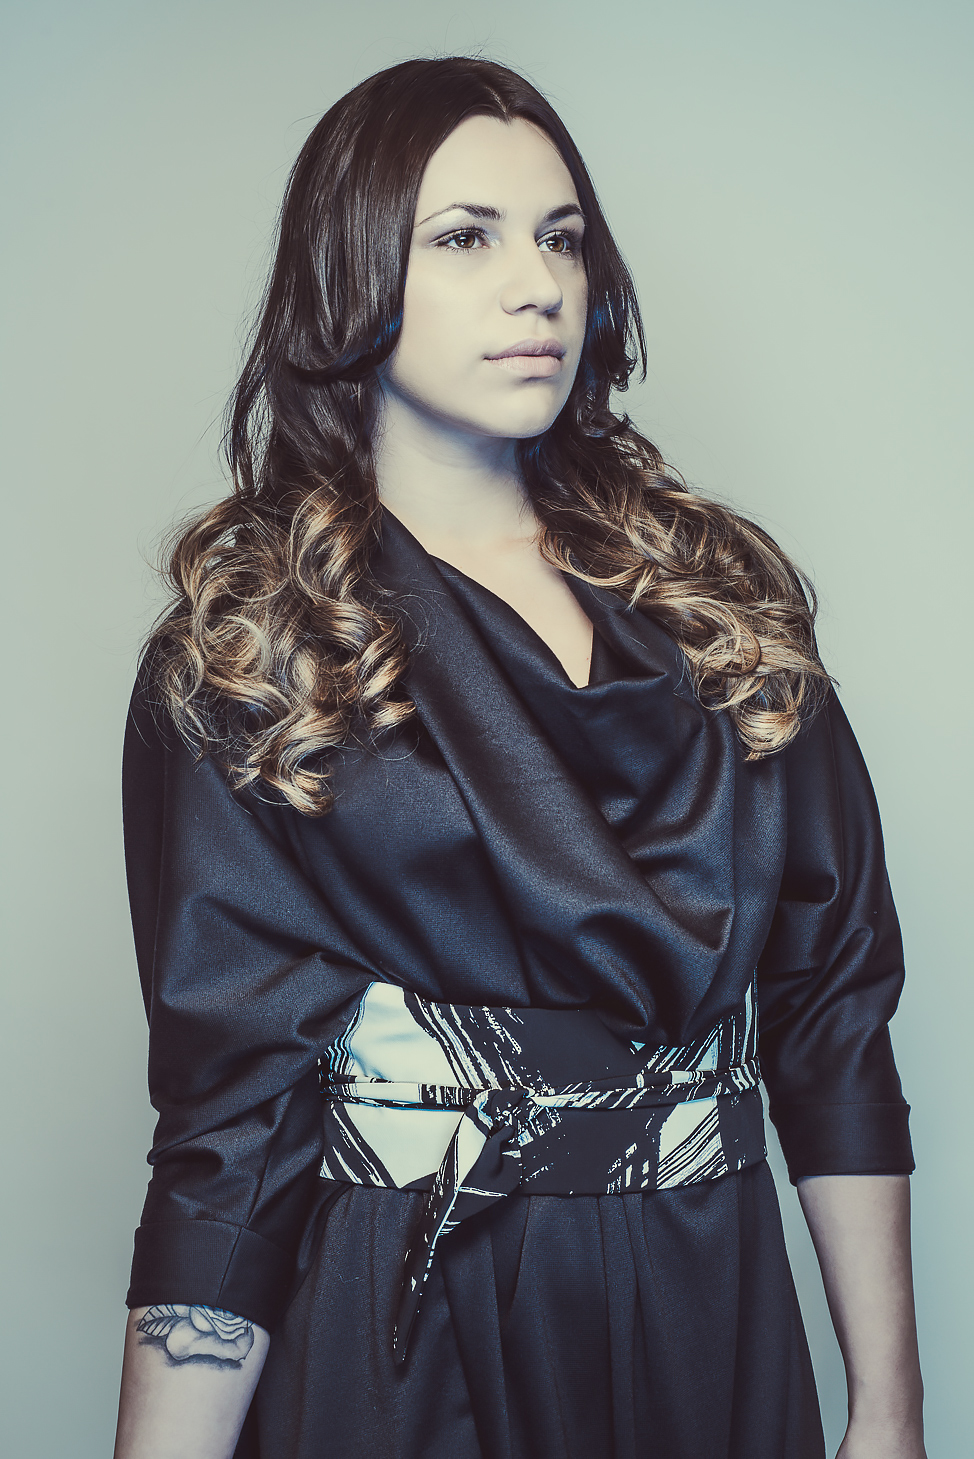 zaramia-ava-zaramiaava-leeds-fashion-designer-ethical-sustainable-tailored-minimalist-aya-print-dress-obi-belt-black-versatile-drape-cowl-styling-womenswear-models-photoshoot-shrine-hairdressers-15